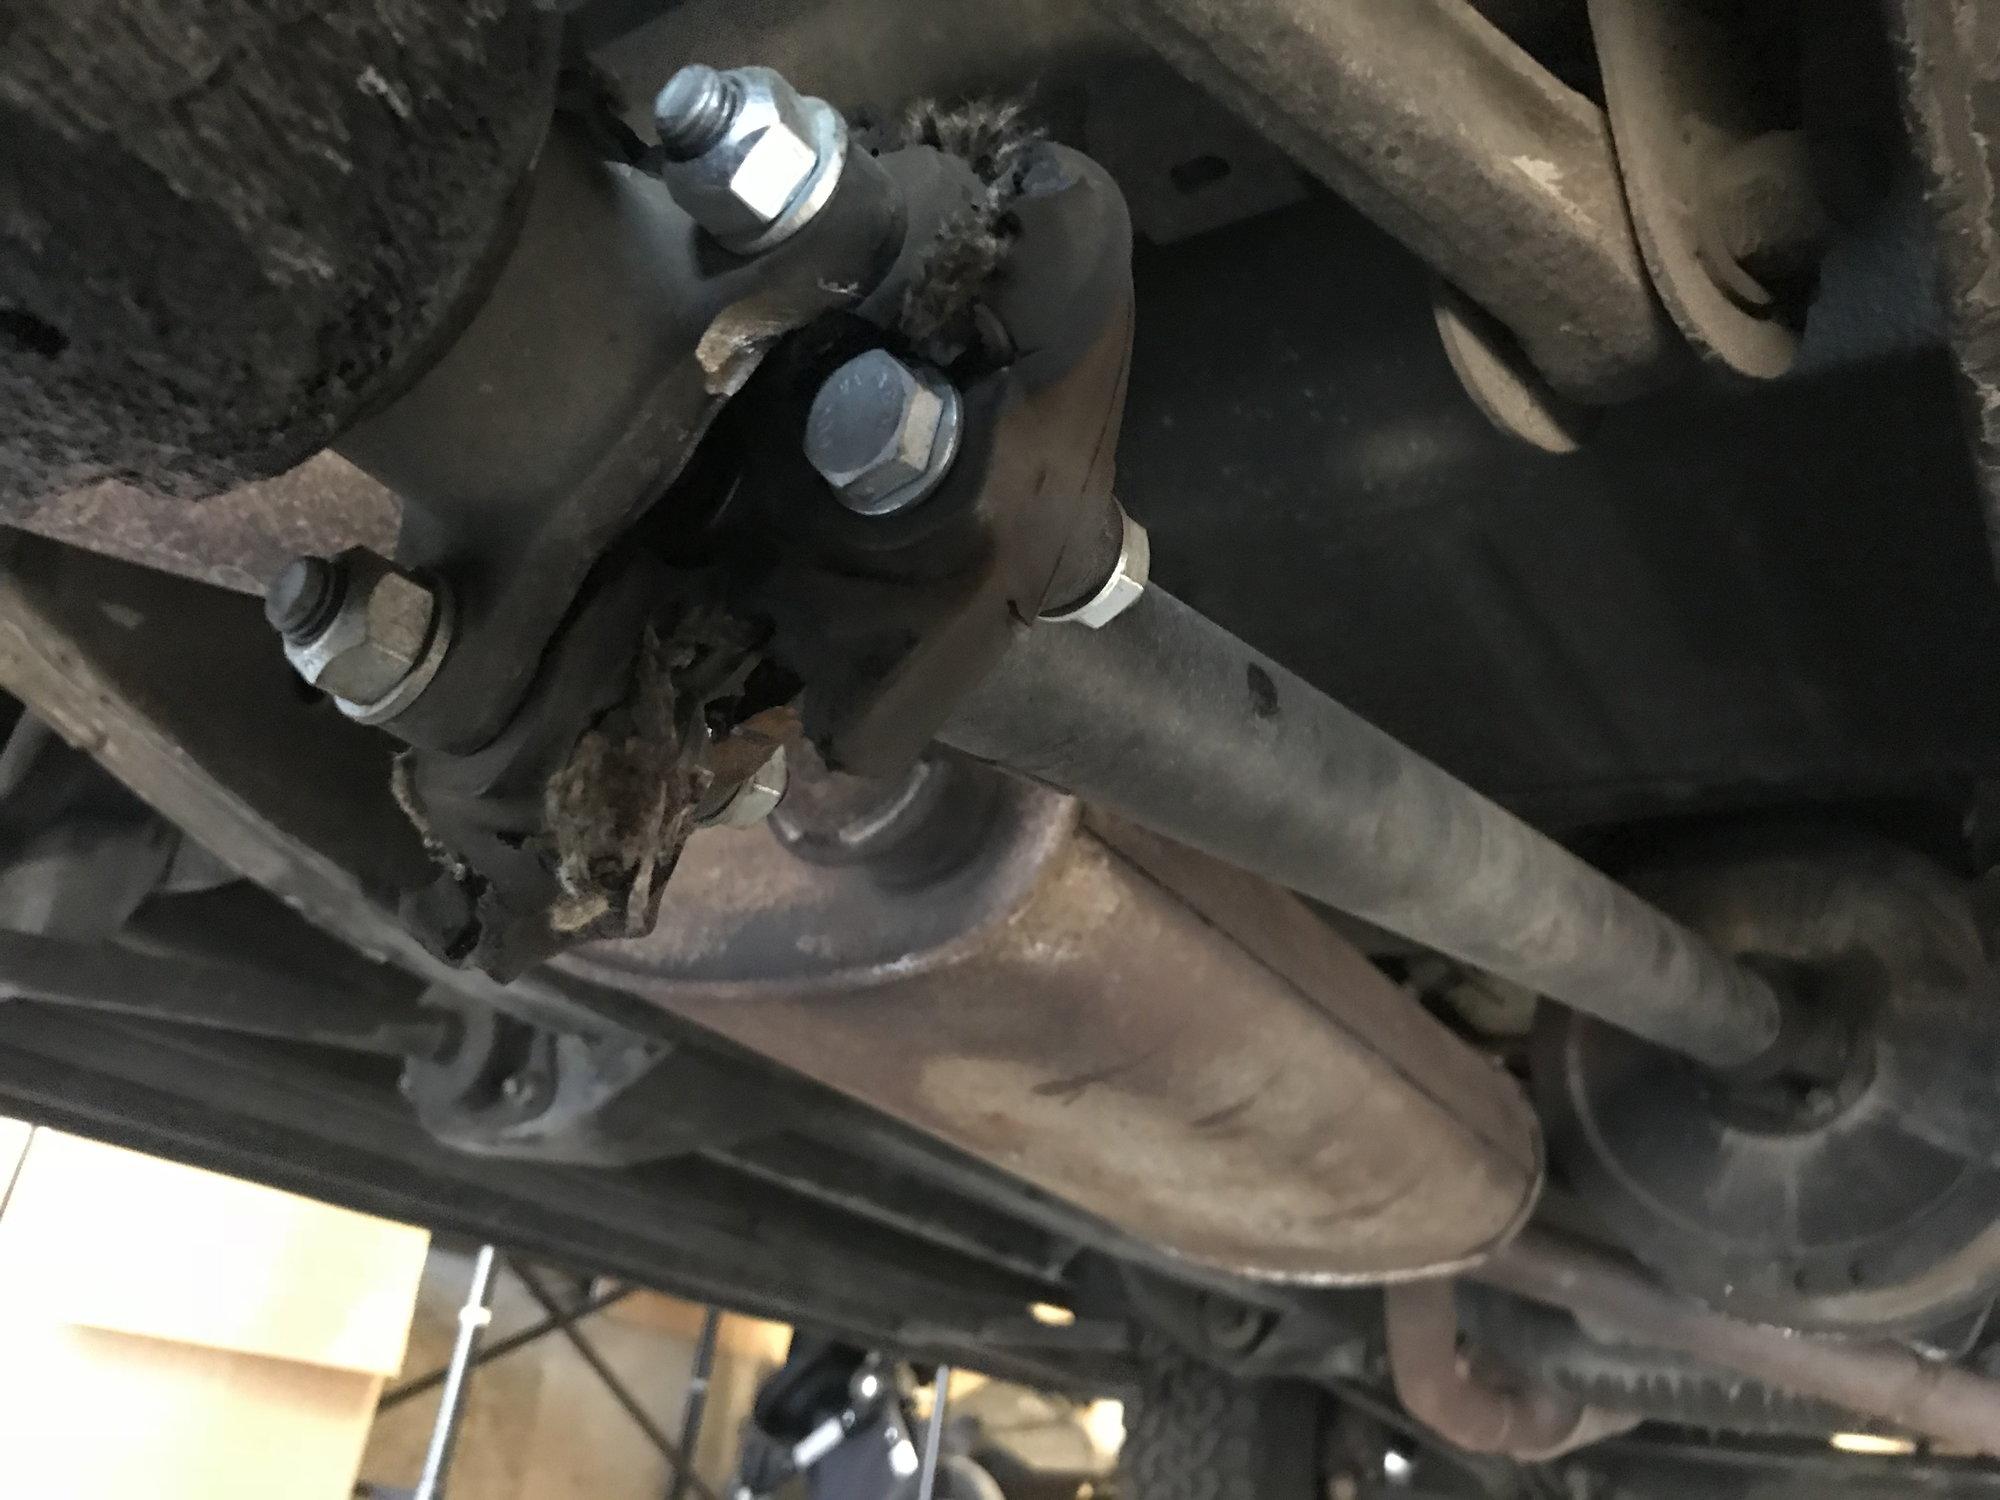 Rear Drive Shaft Disintegrating - Land Rover Forums - Land